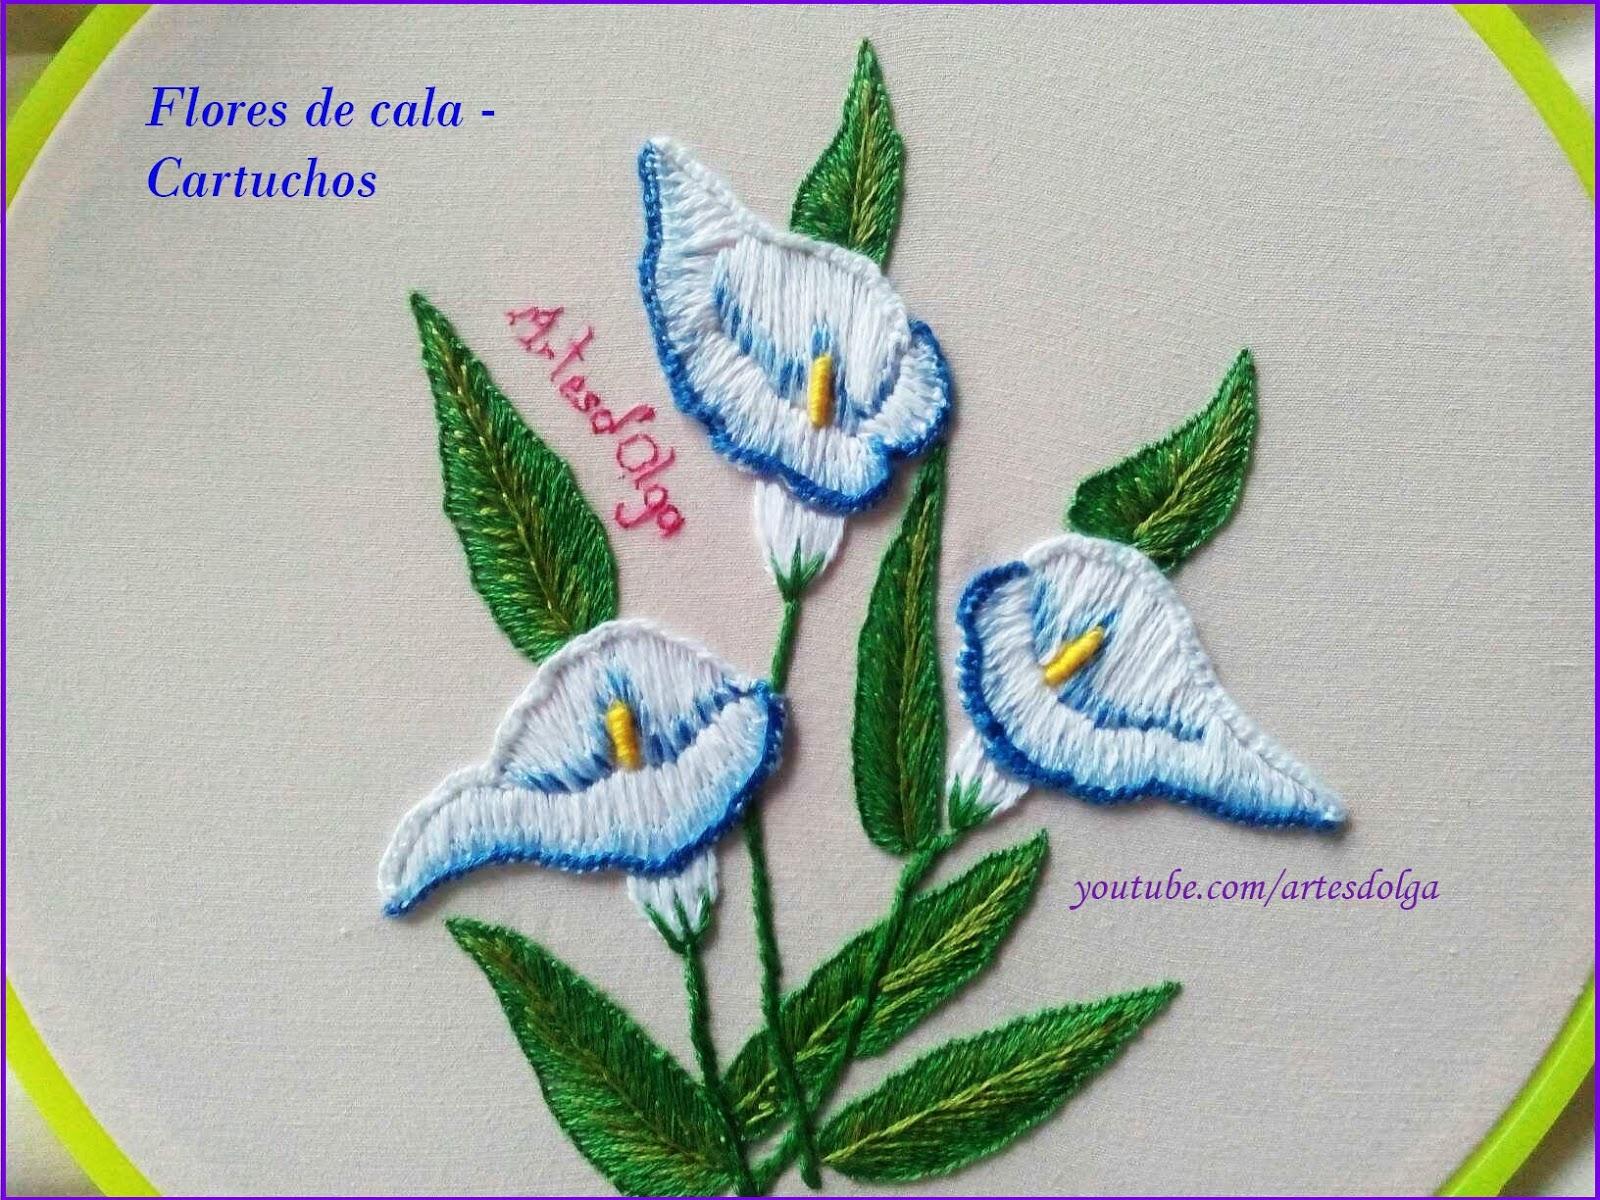 Artesd\'Olga: Bordados a mano: Flor de Cala – Alcatraz – Cartucho ...